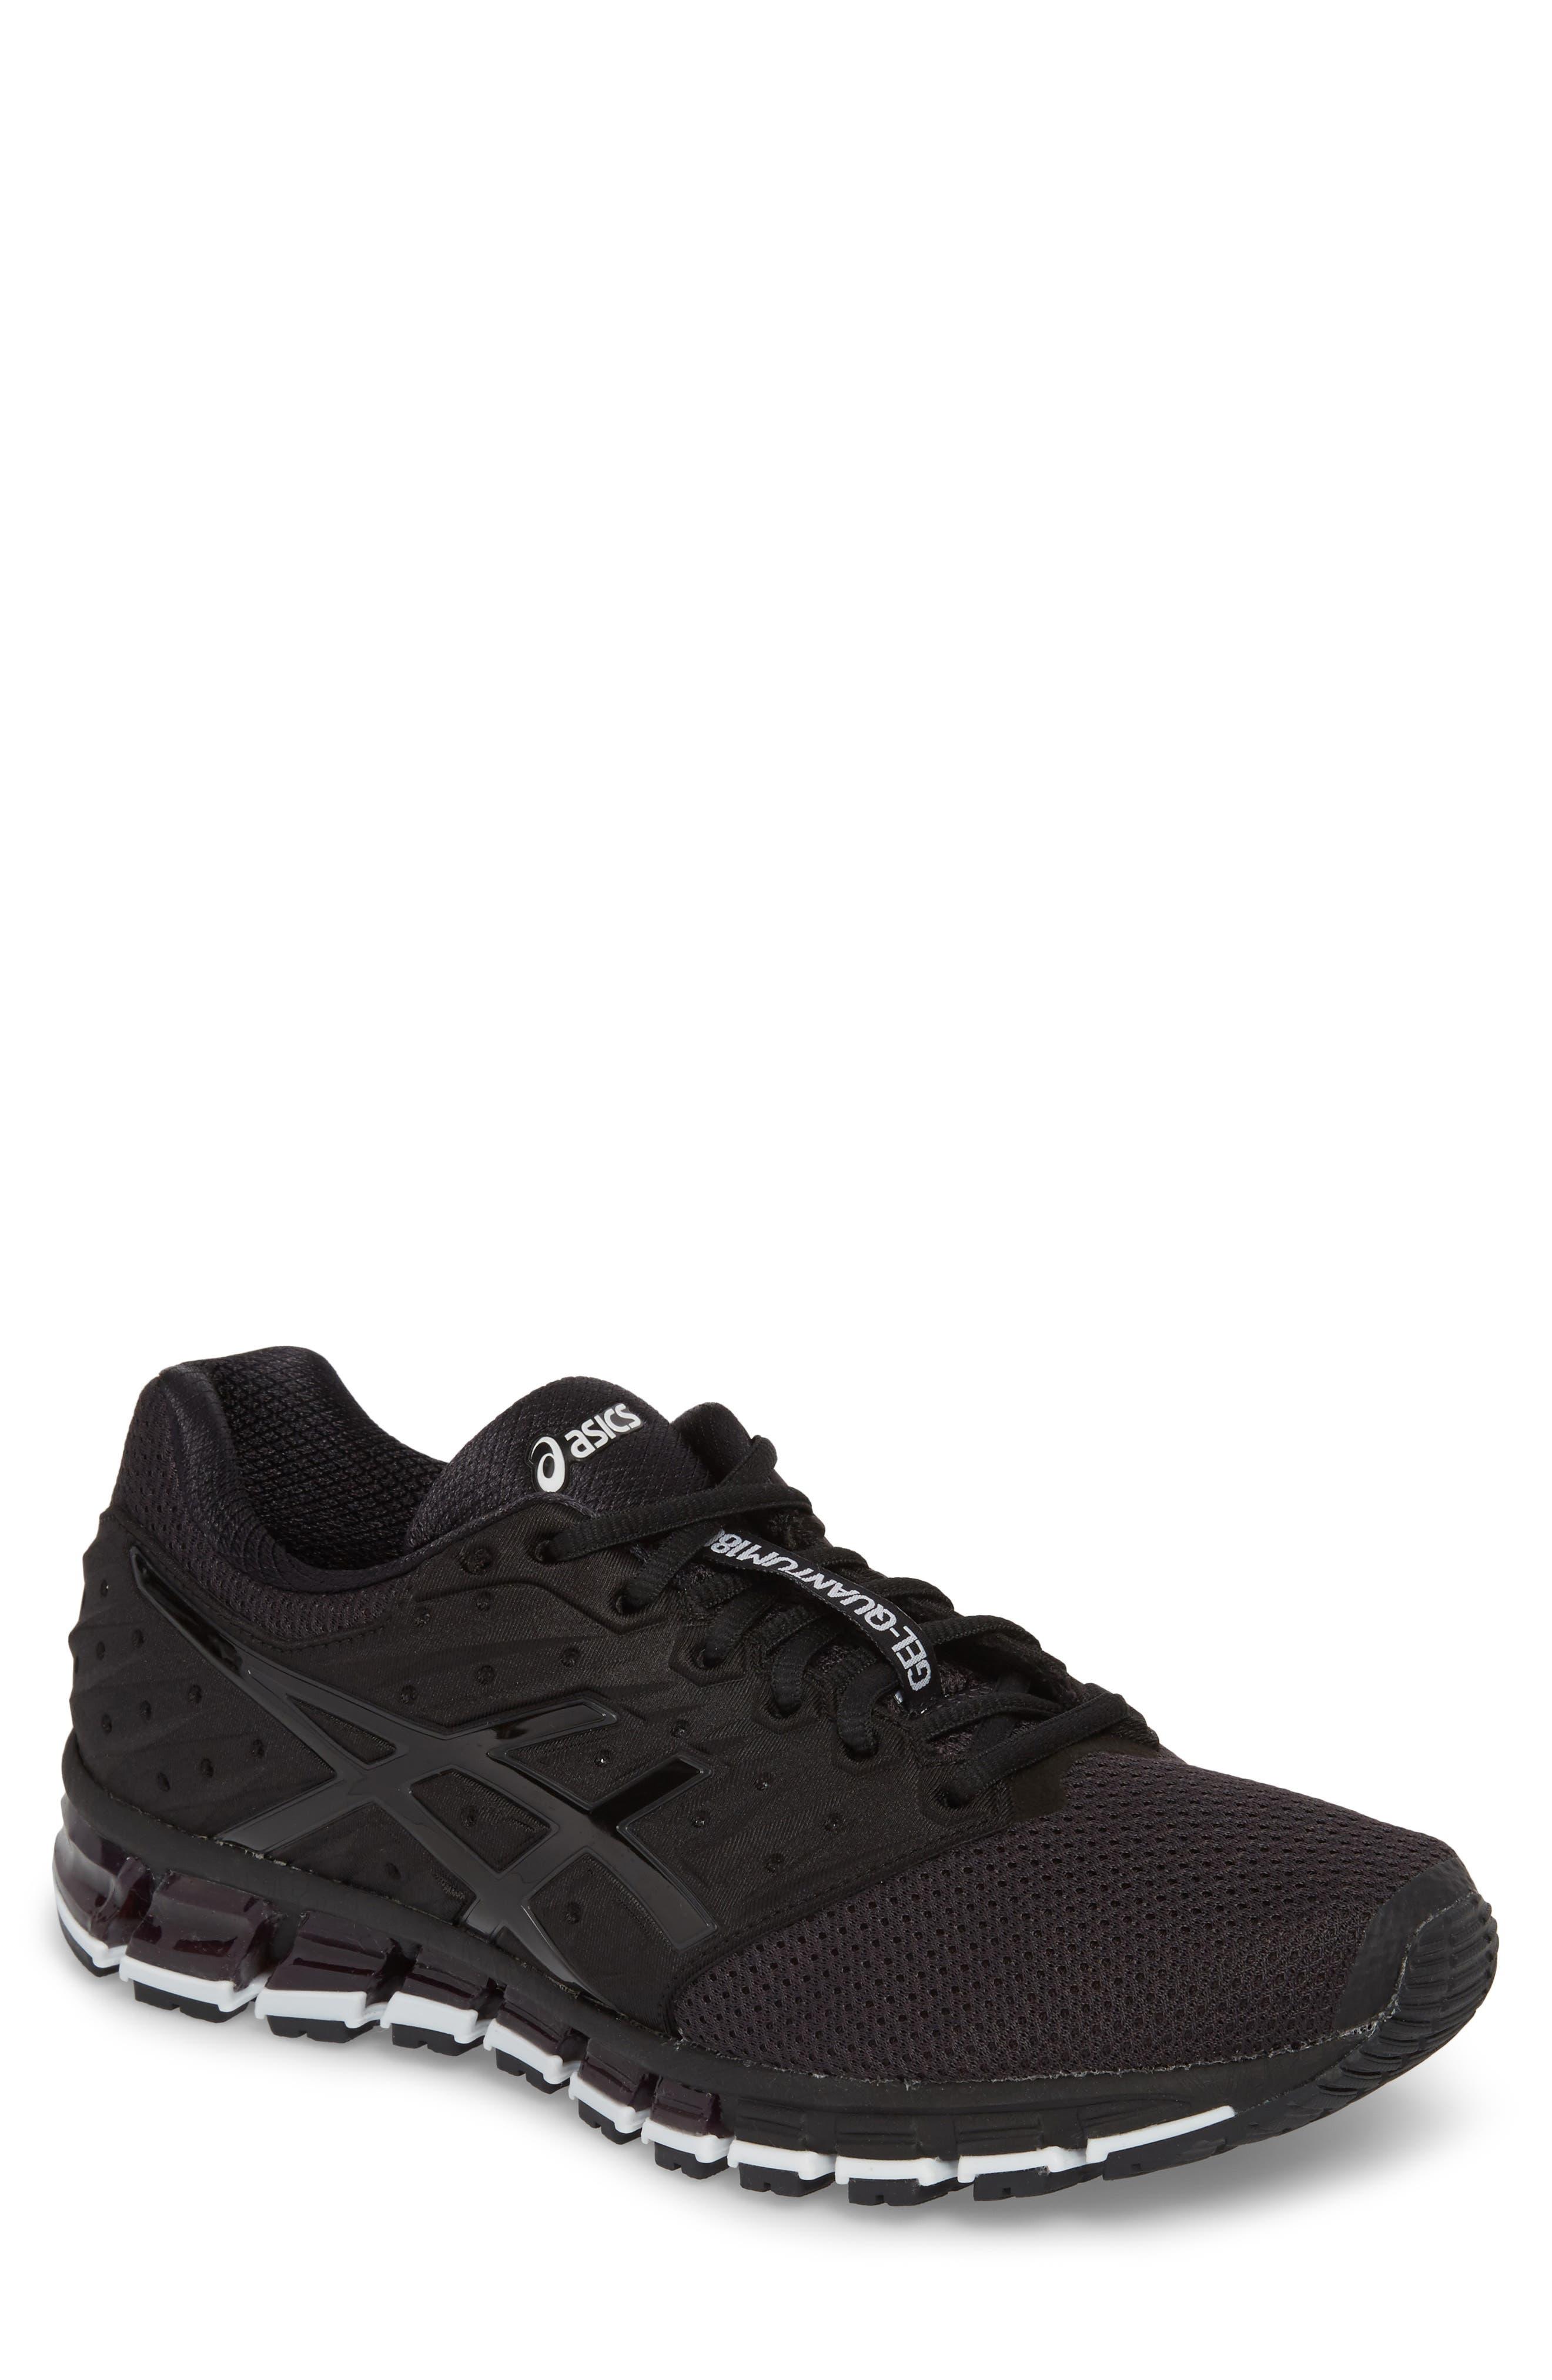 GEL-Quantum 180 2 MX Running Shoe,                             Main thumbnail 1, color,                             Phantom/ Black/ White